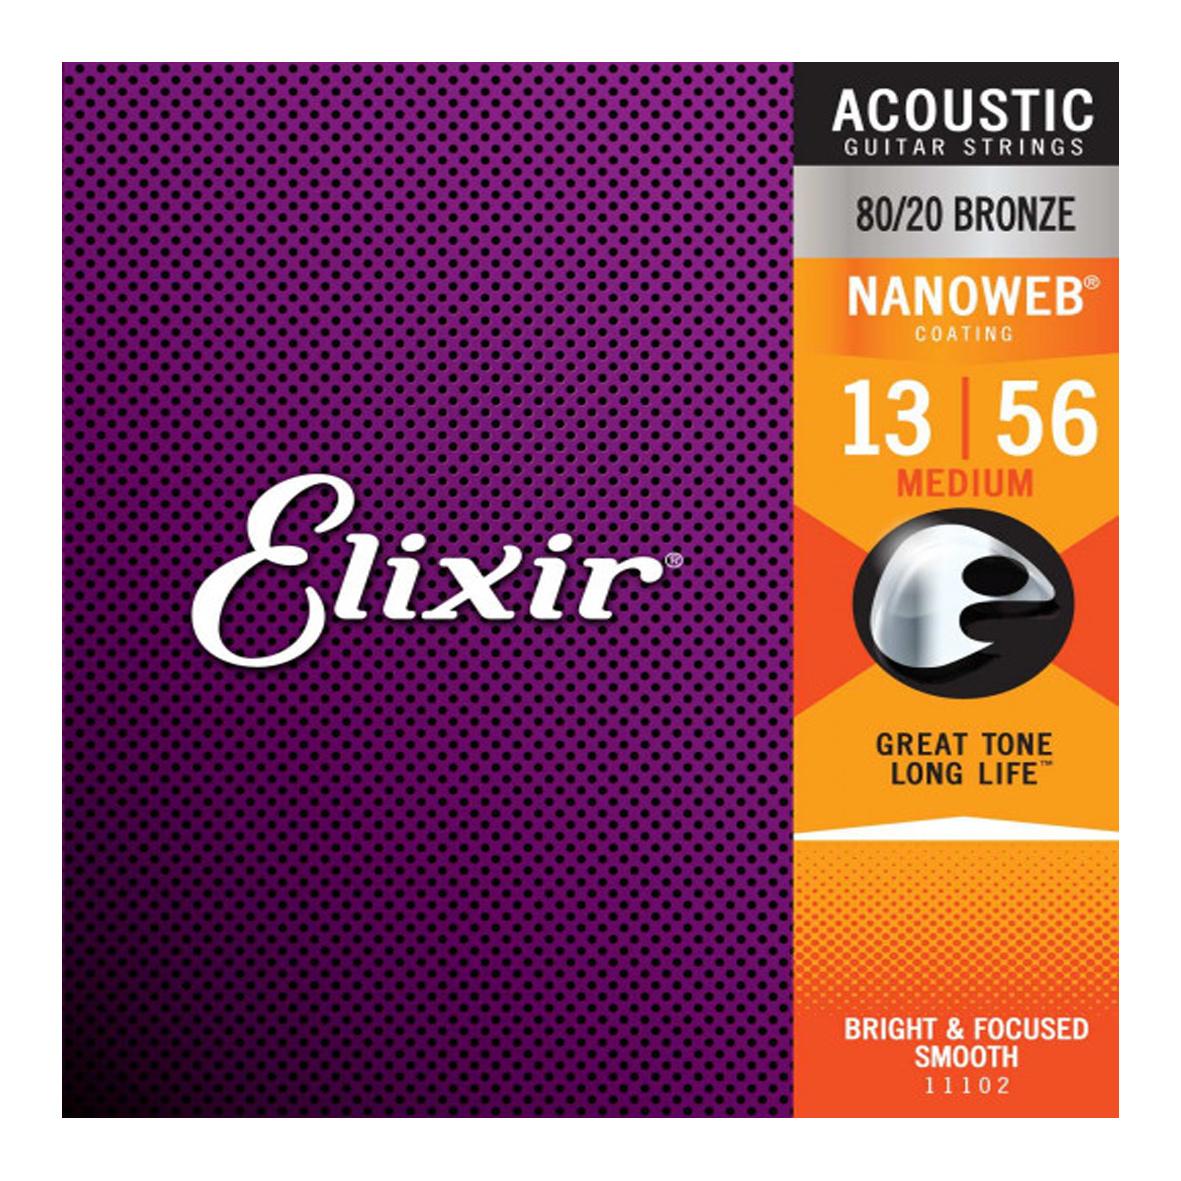 Elixir Elixir - 13-56 - Nanoweb Medium - 11102 - 80/20 Bronze